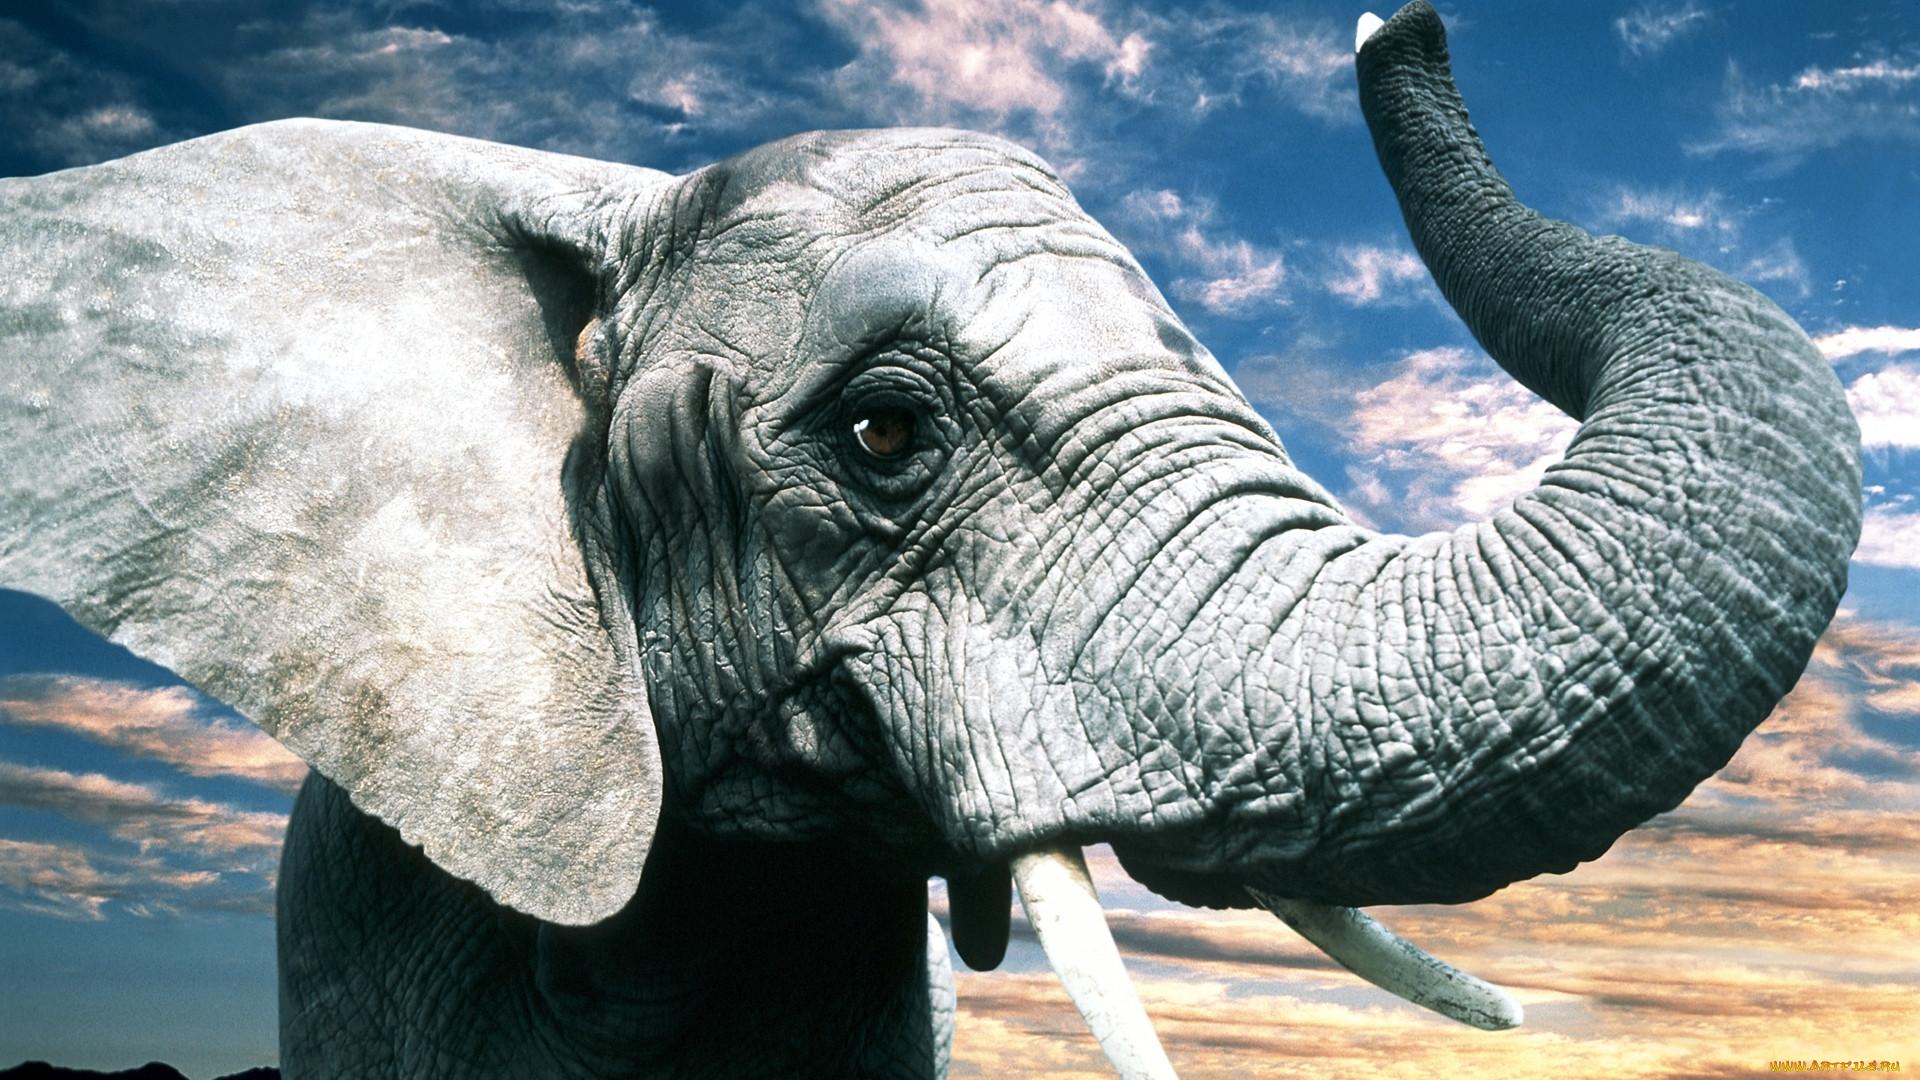 картинки слон хобот рецептуре приготовления